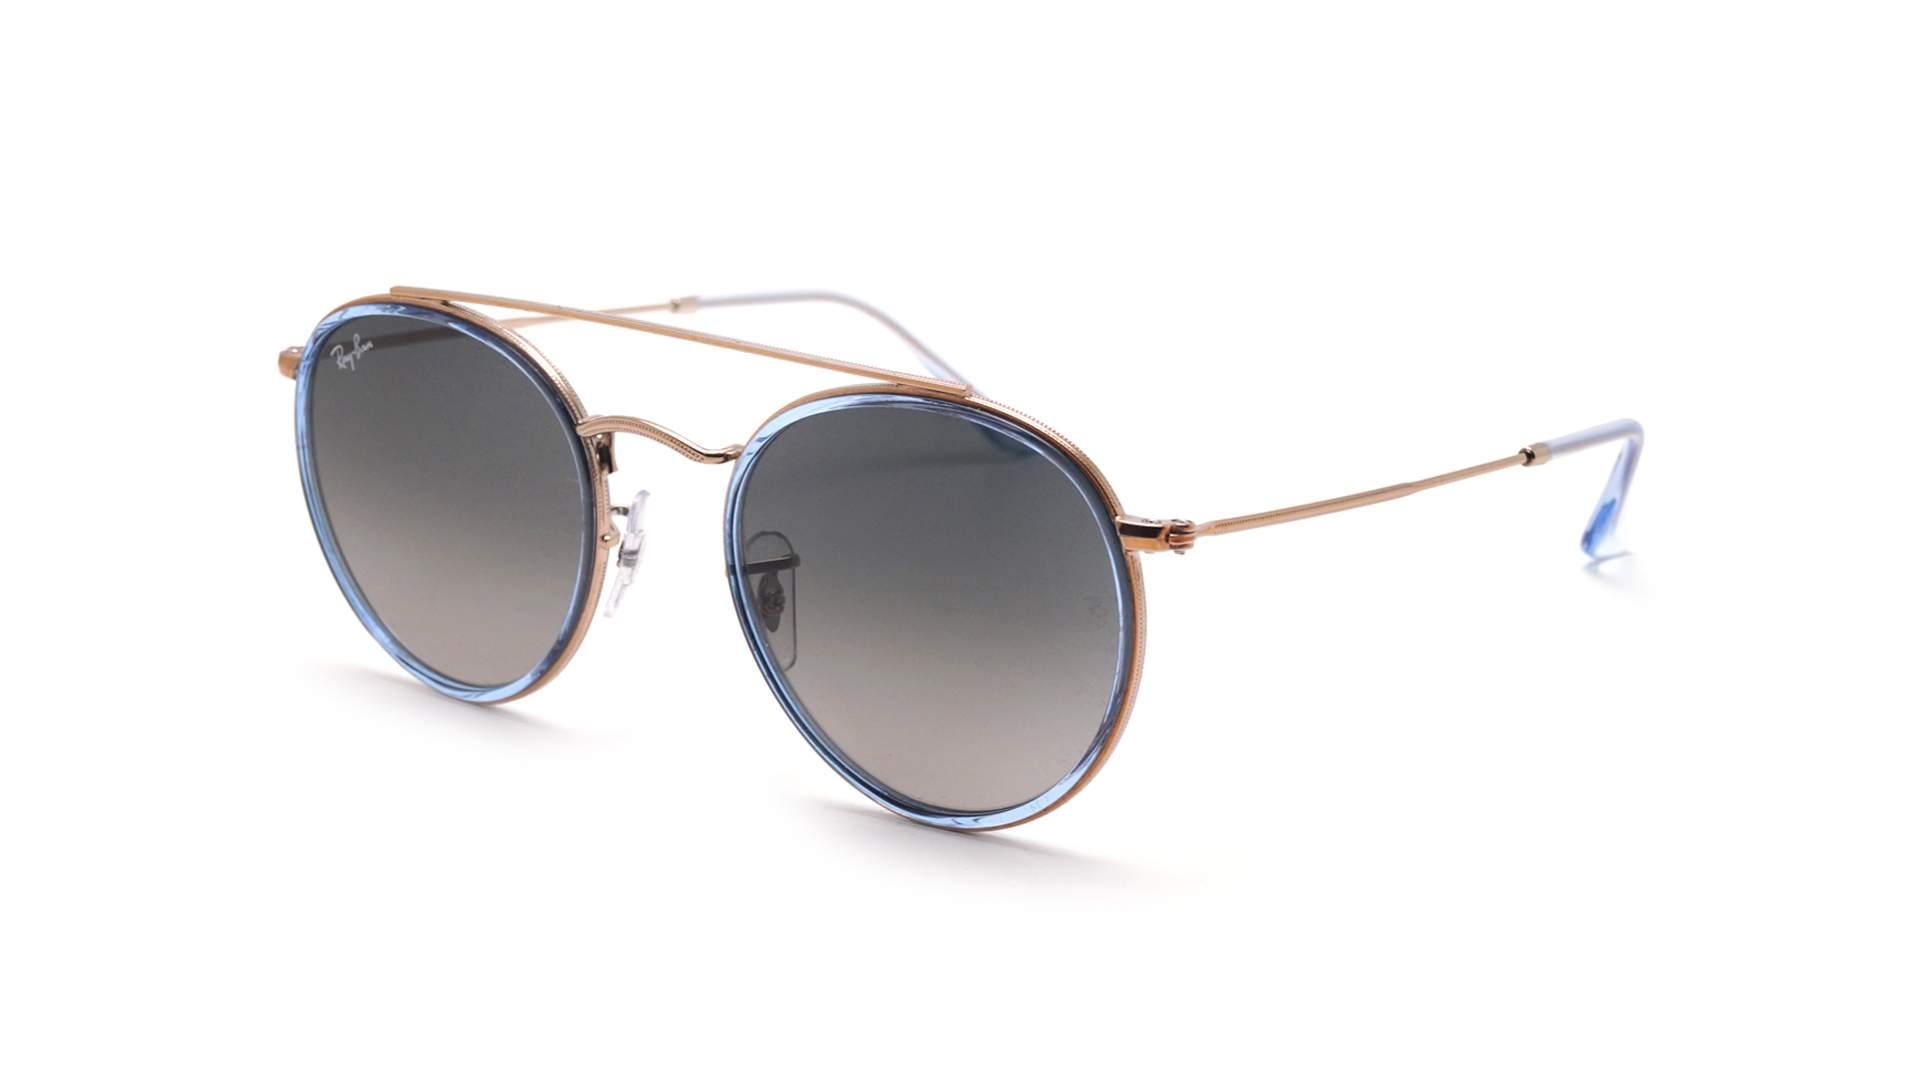 6e53a1d5c41 Sunglasses Ray-Ban Round Double Bridge Blue RB3647N 9067 71 51-22 Medium  Gradient